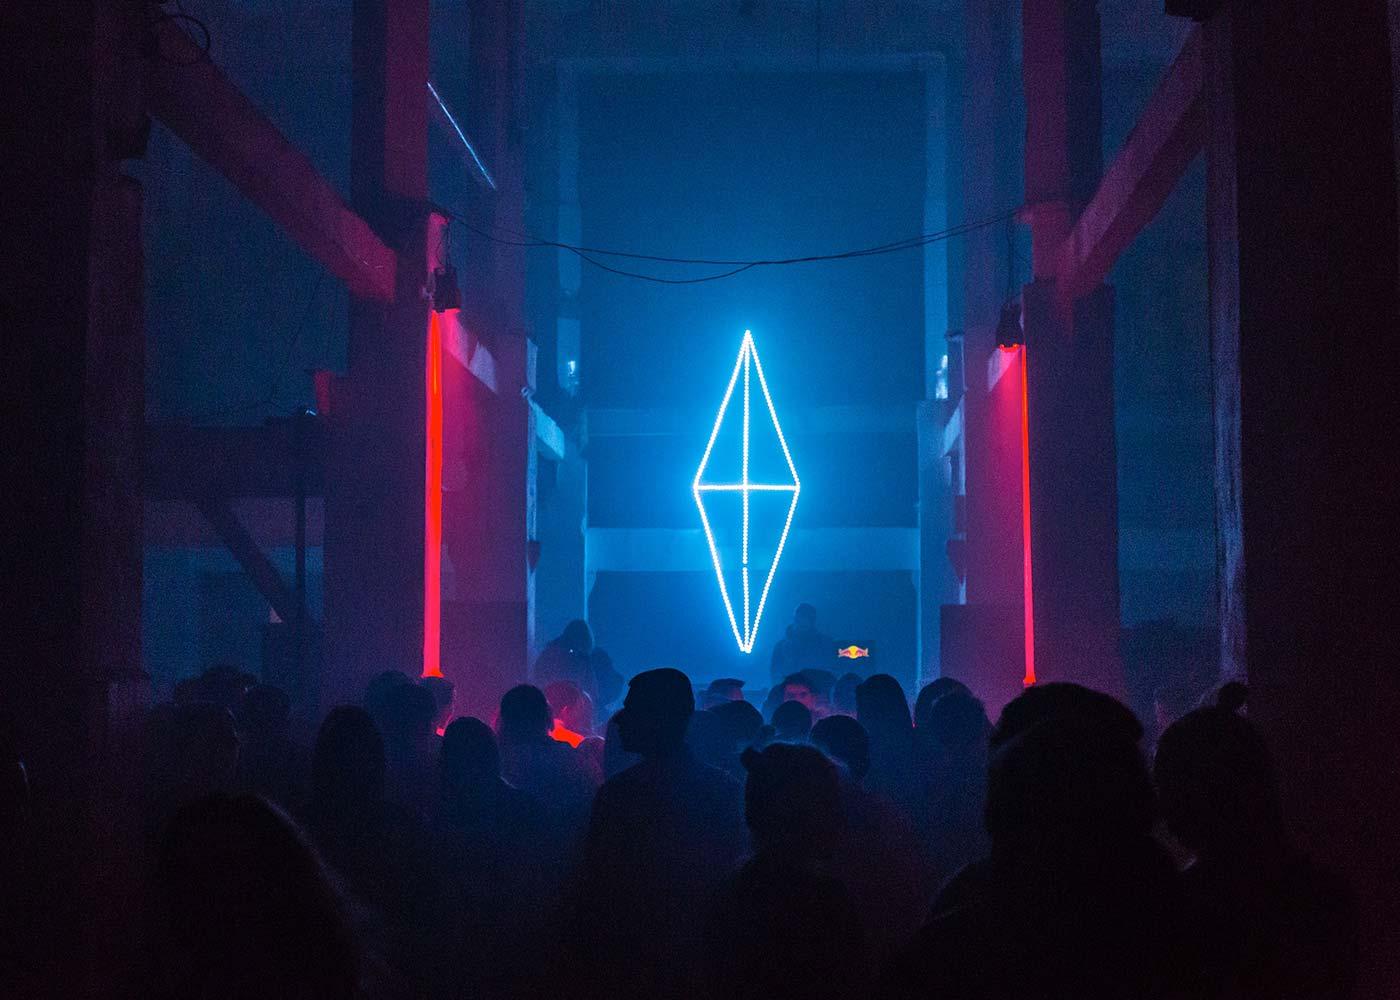 Neon VI